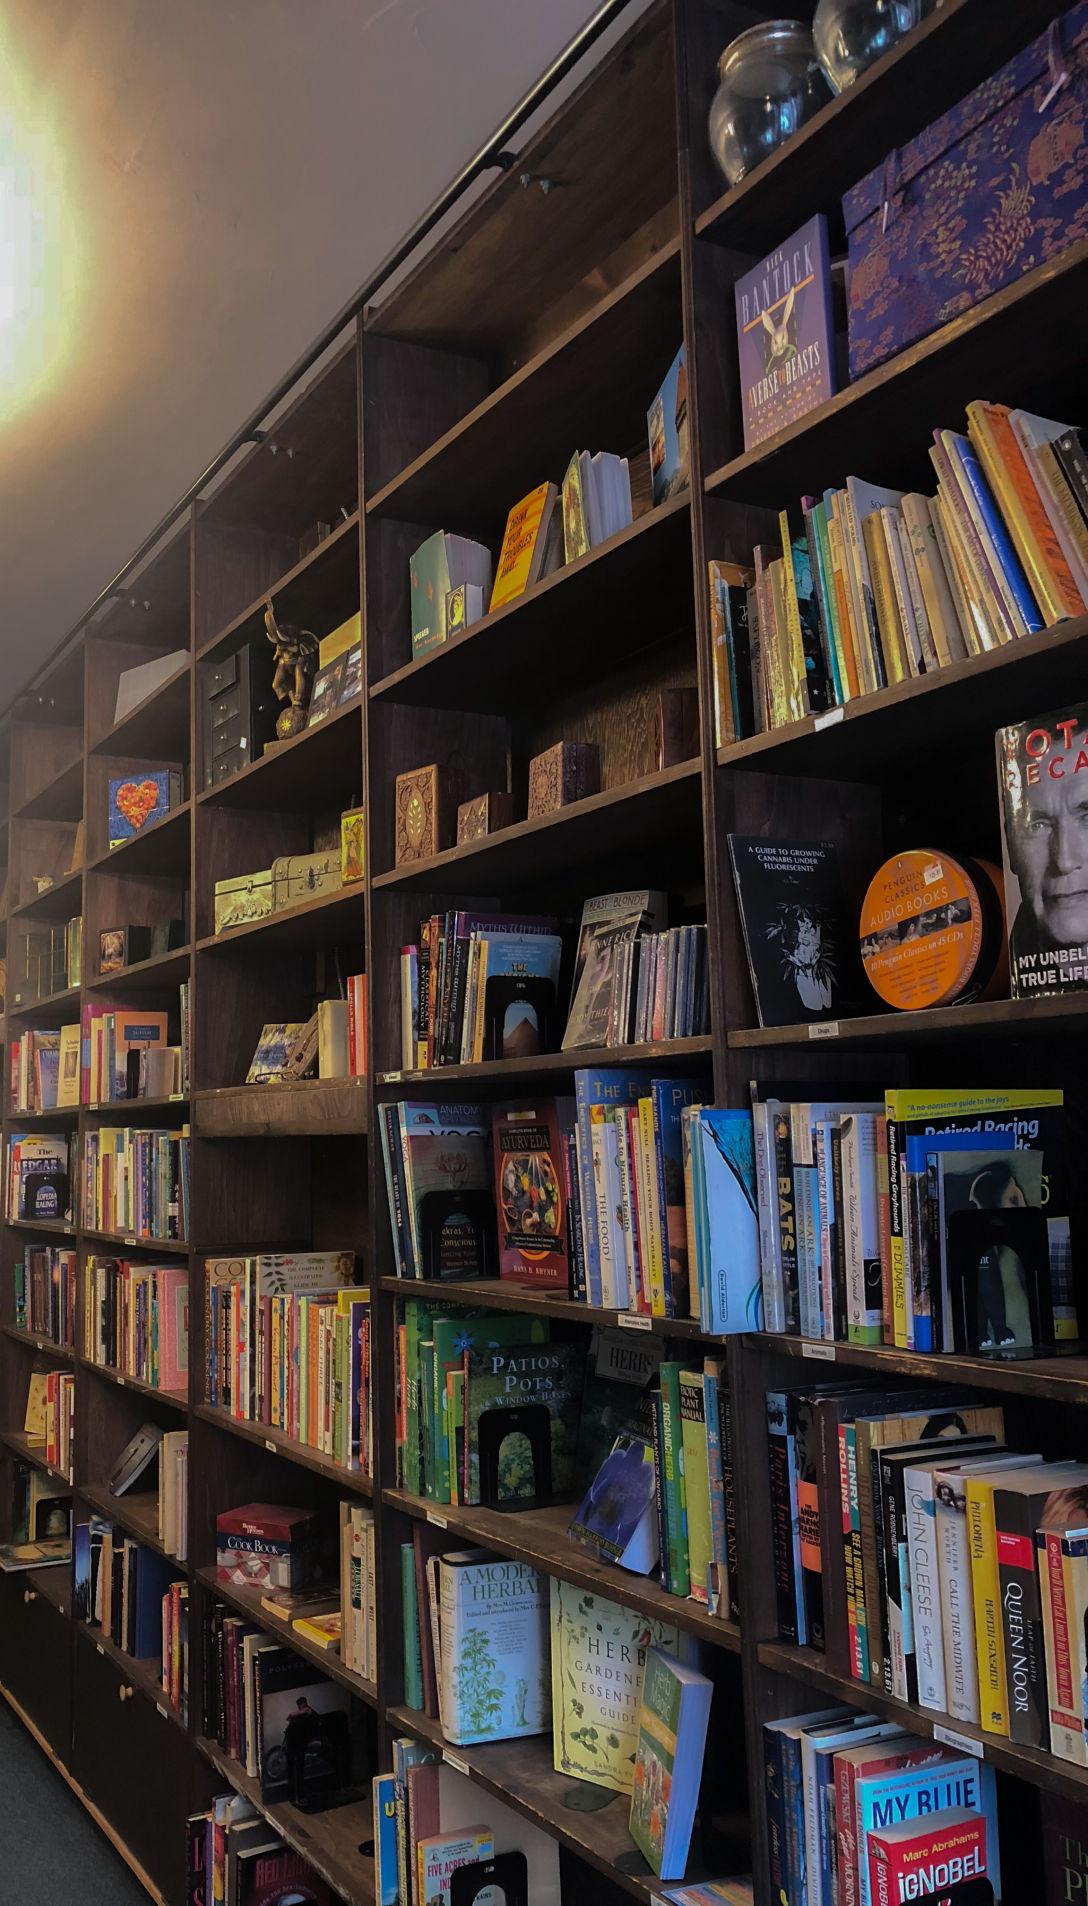 Bookshops in London - Safiya Chagani Mystic Bookshop bookshelves(9 of 10).jpg